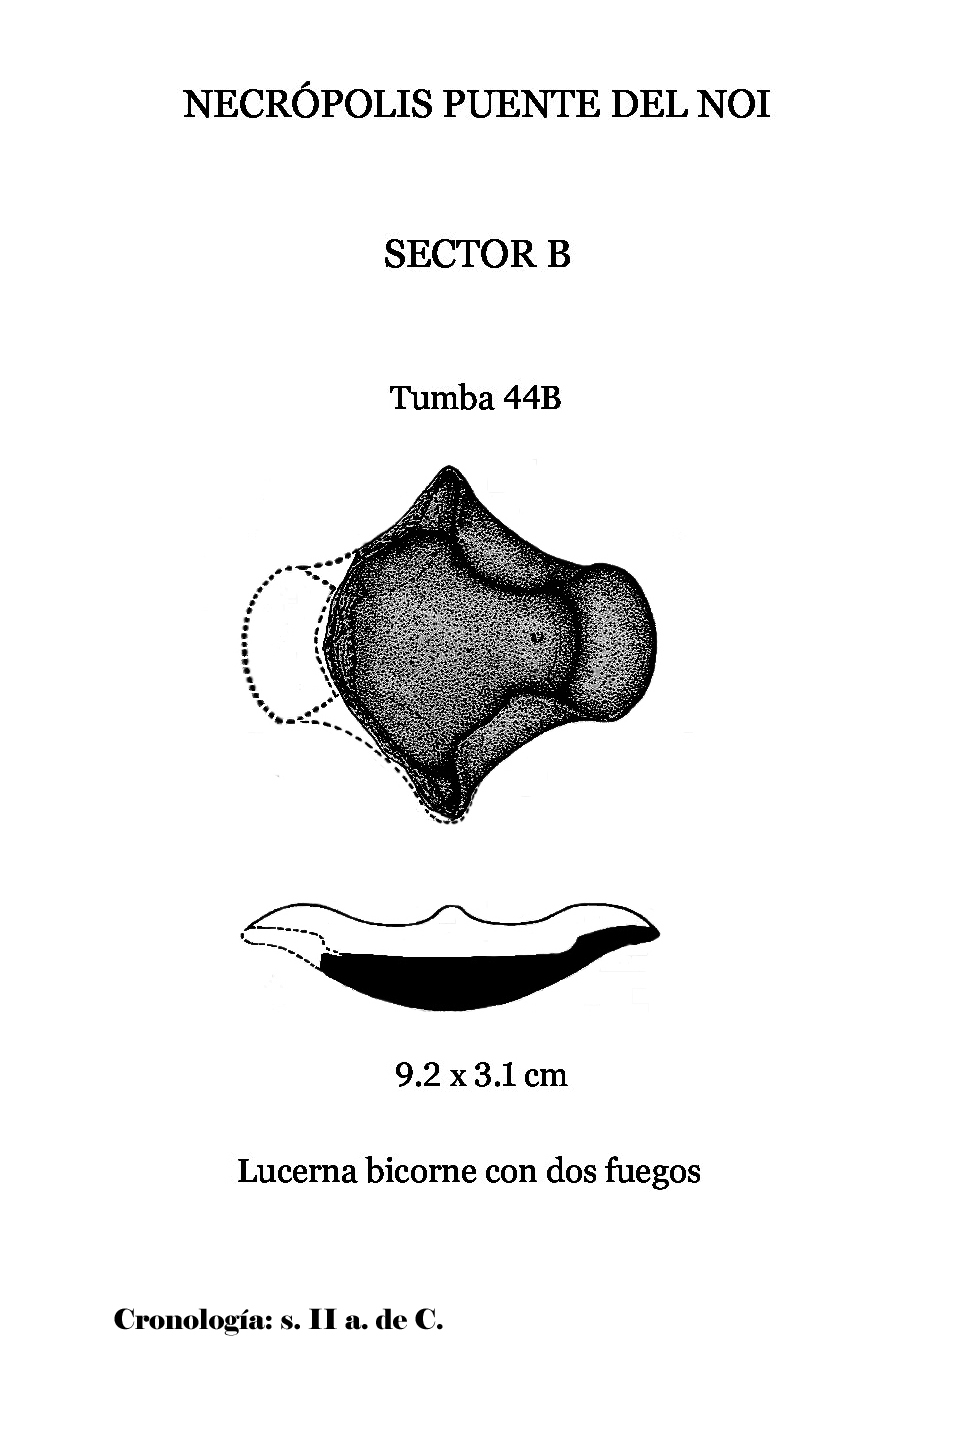 44BPuente del Noi Tumba 44B 14 copia